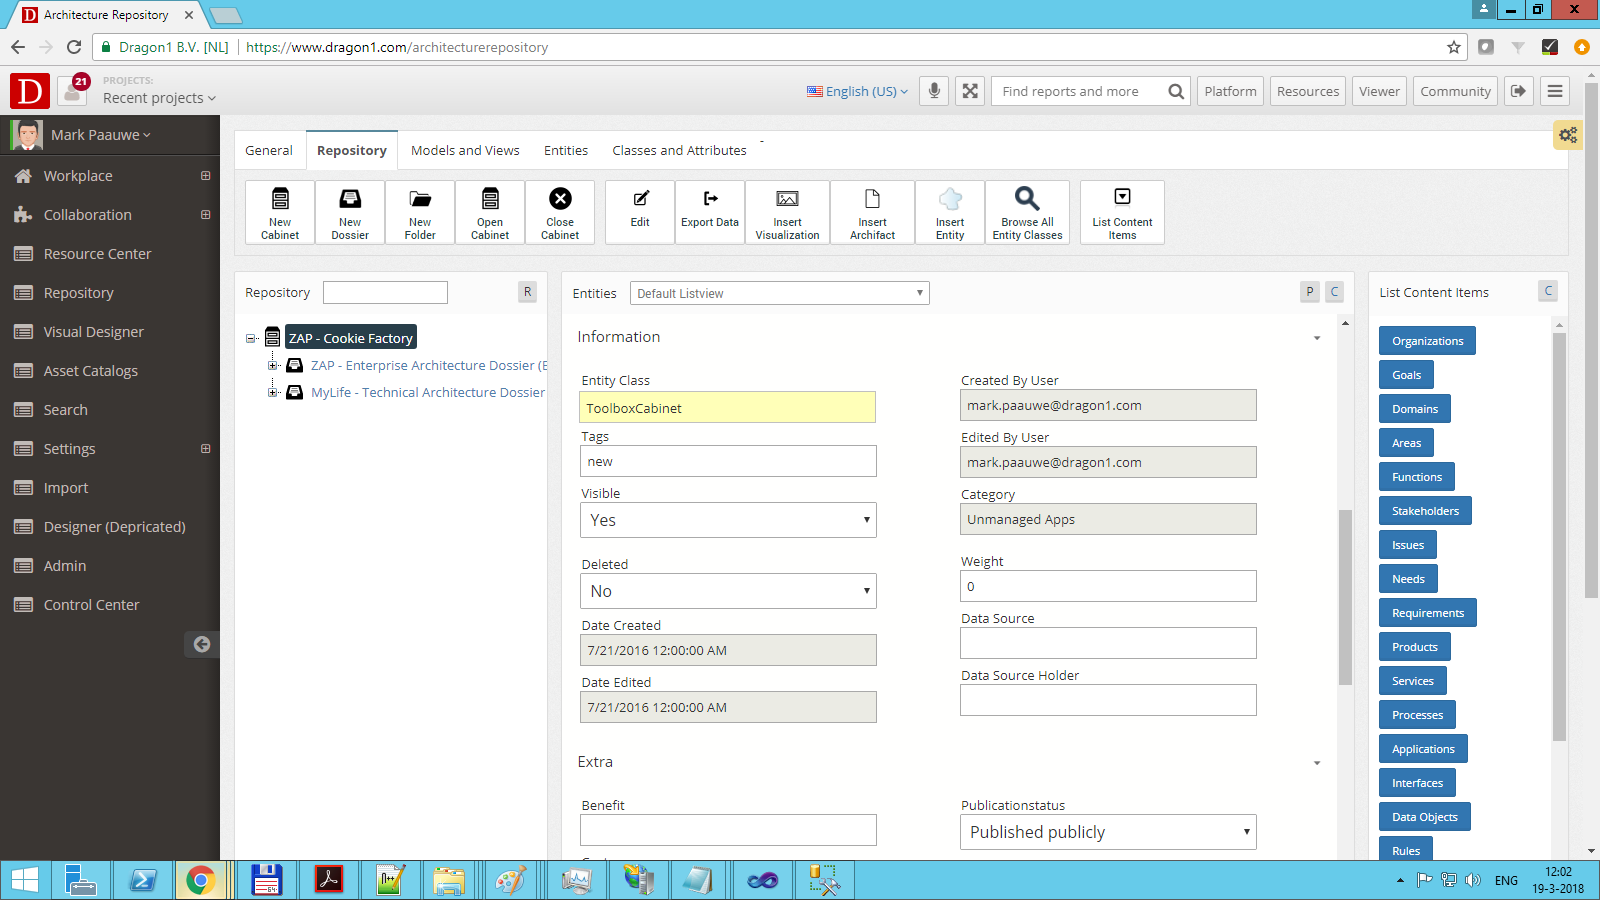 dragon1 attributes in architecture repository in cabinet